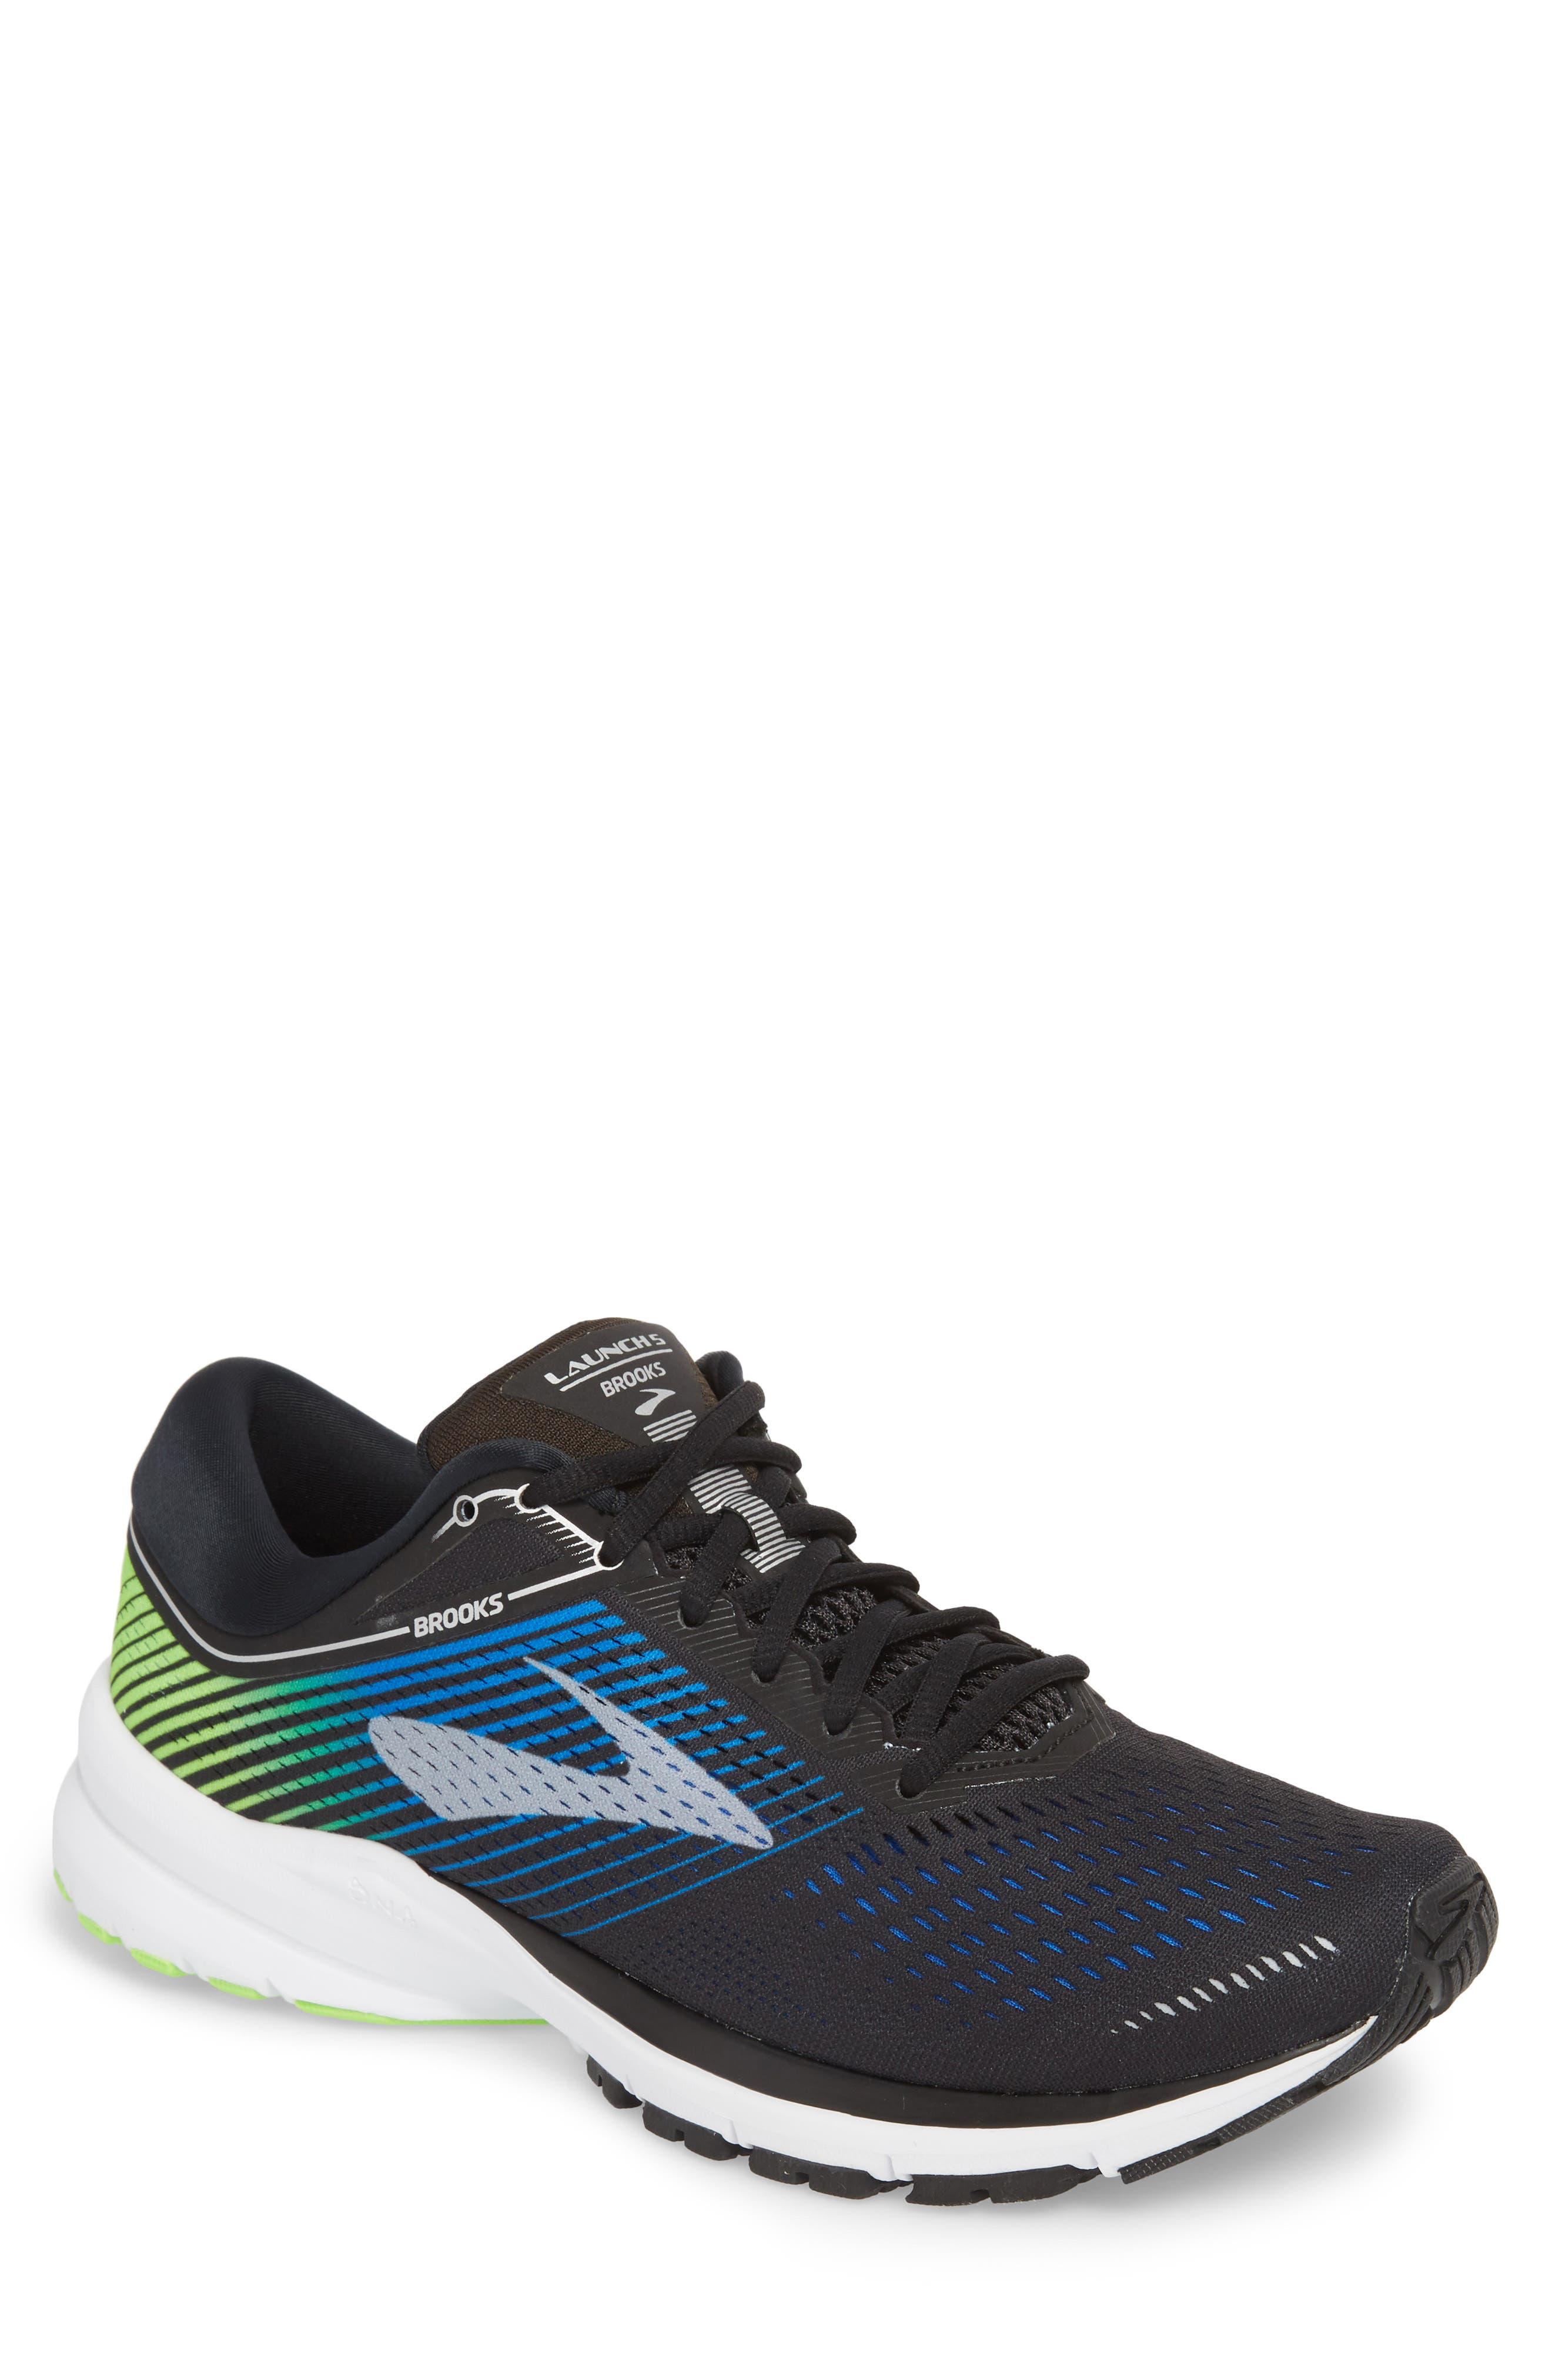 Launch 5 Running Shoe,                             Main thumbnail 1, color,                             016